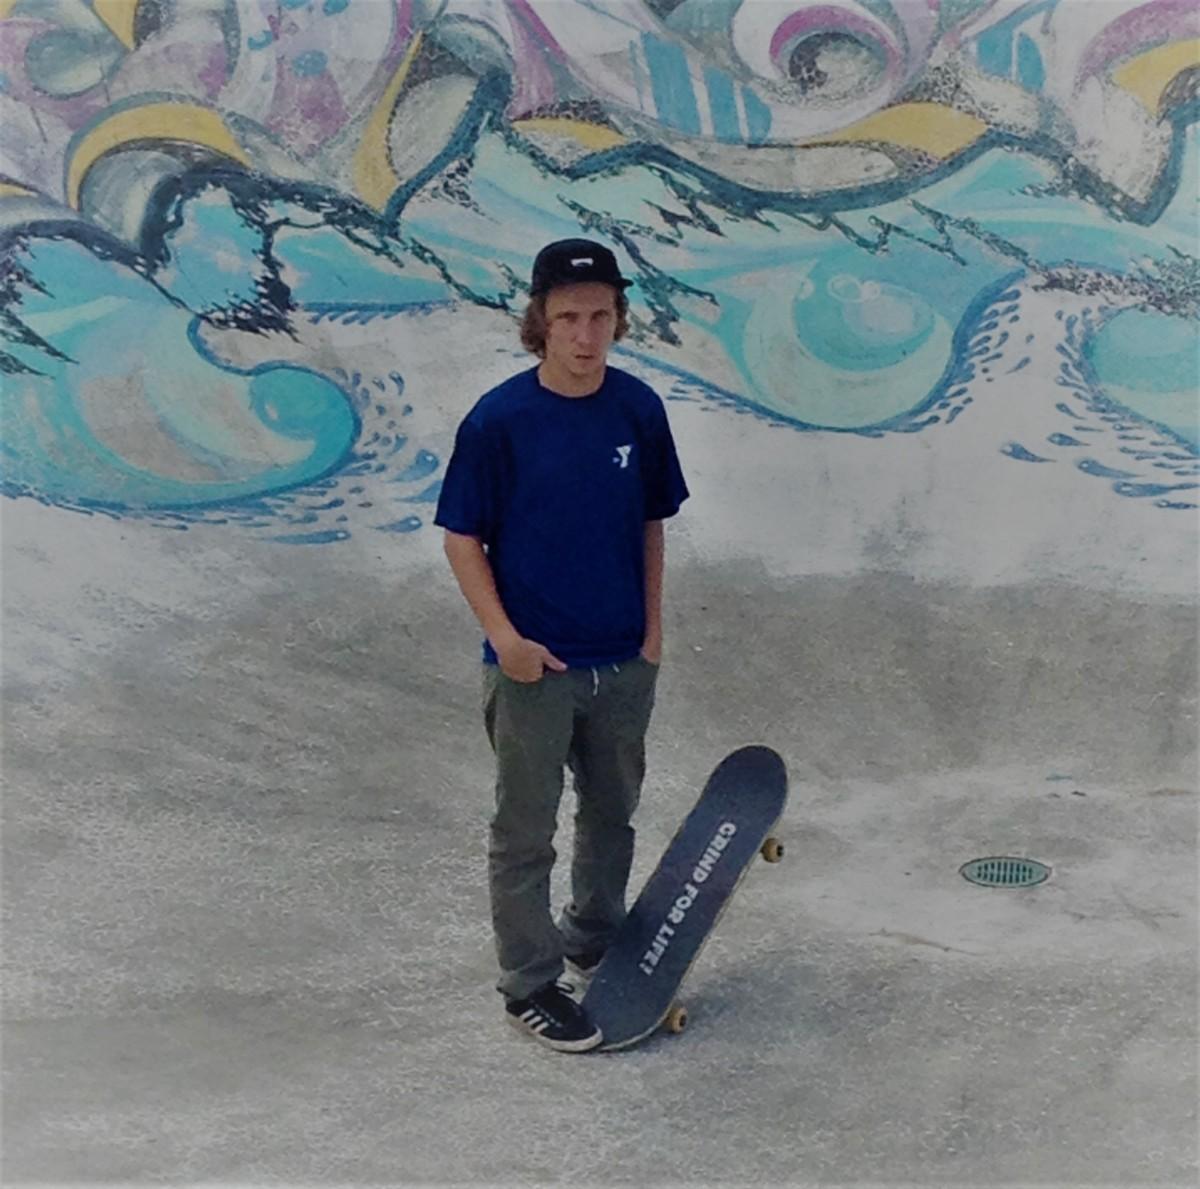 The Positive Side of Skateboarding